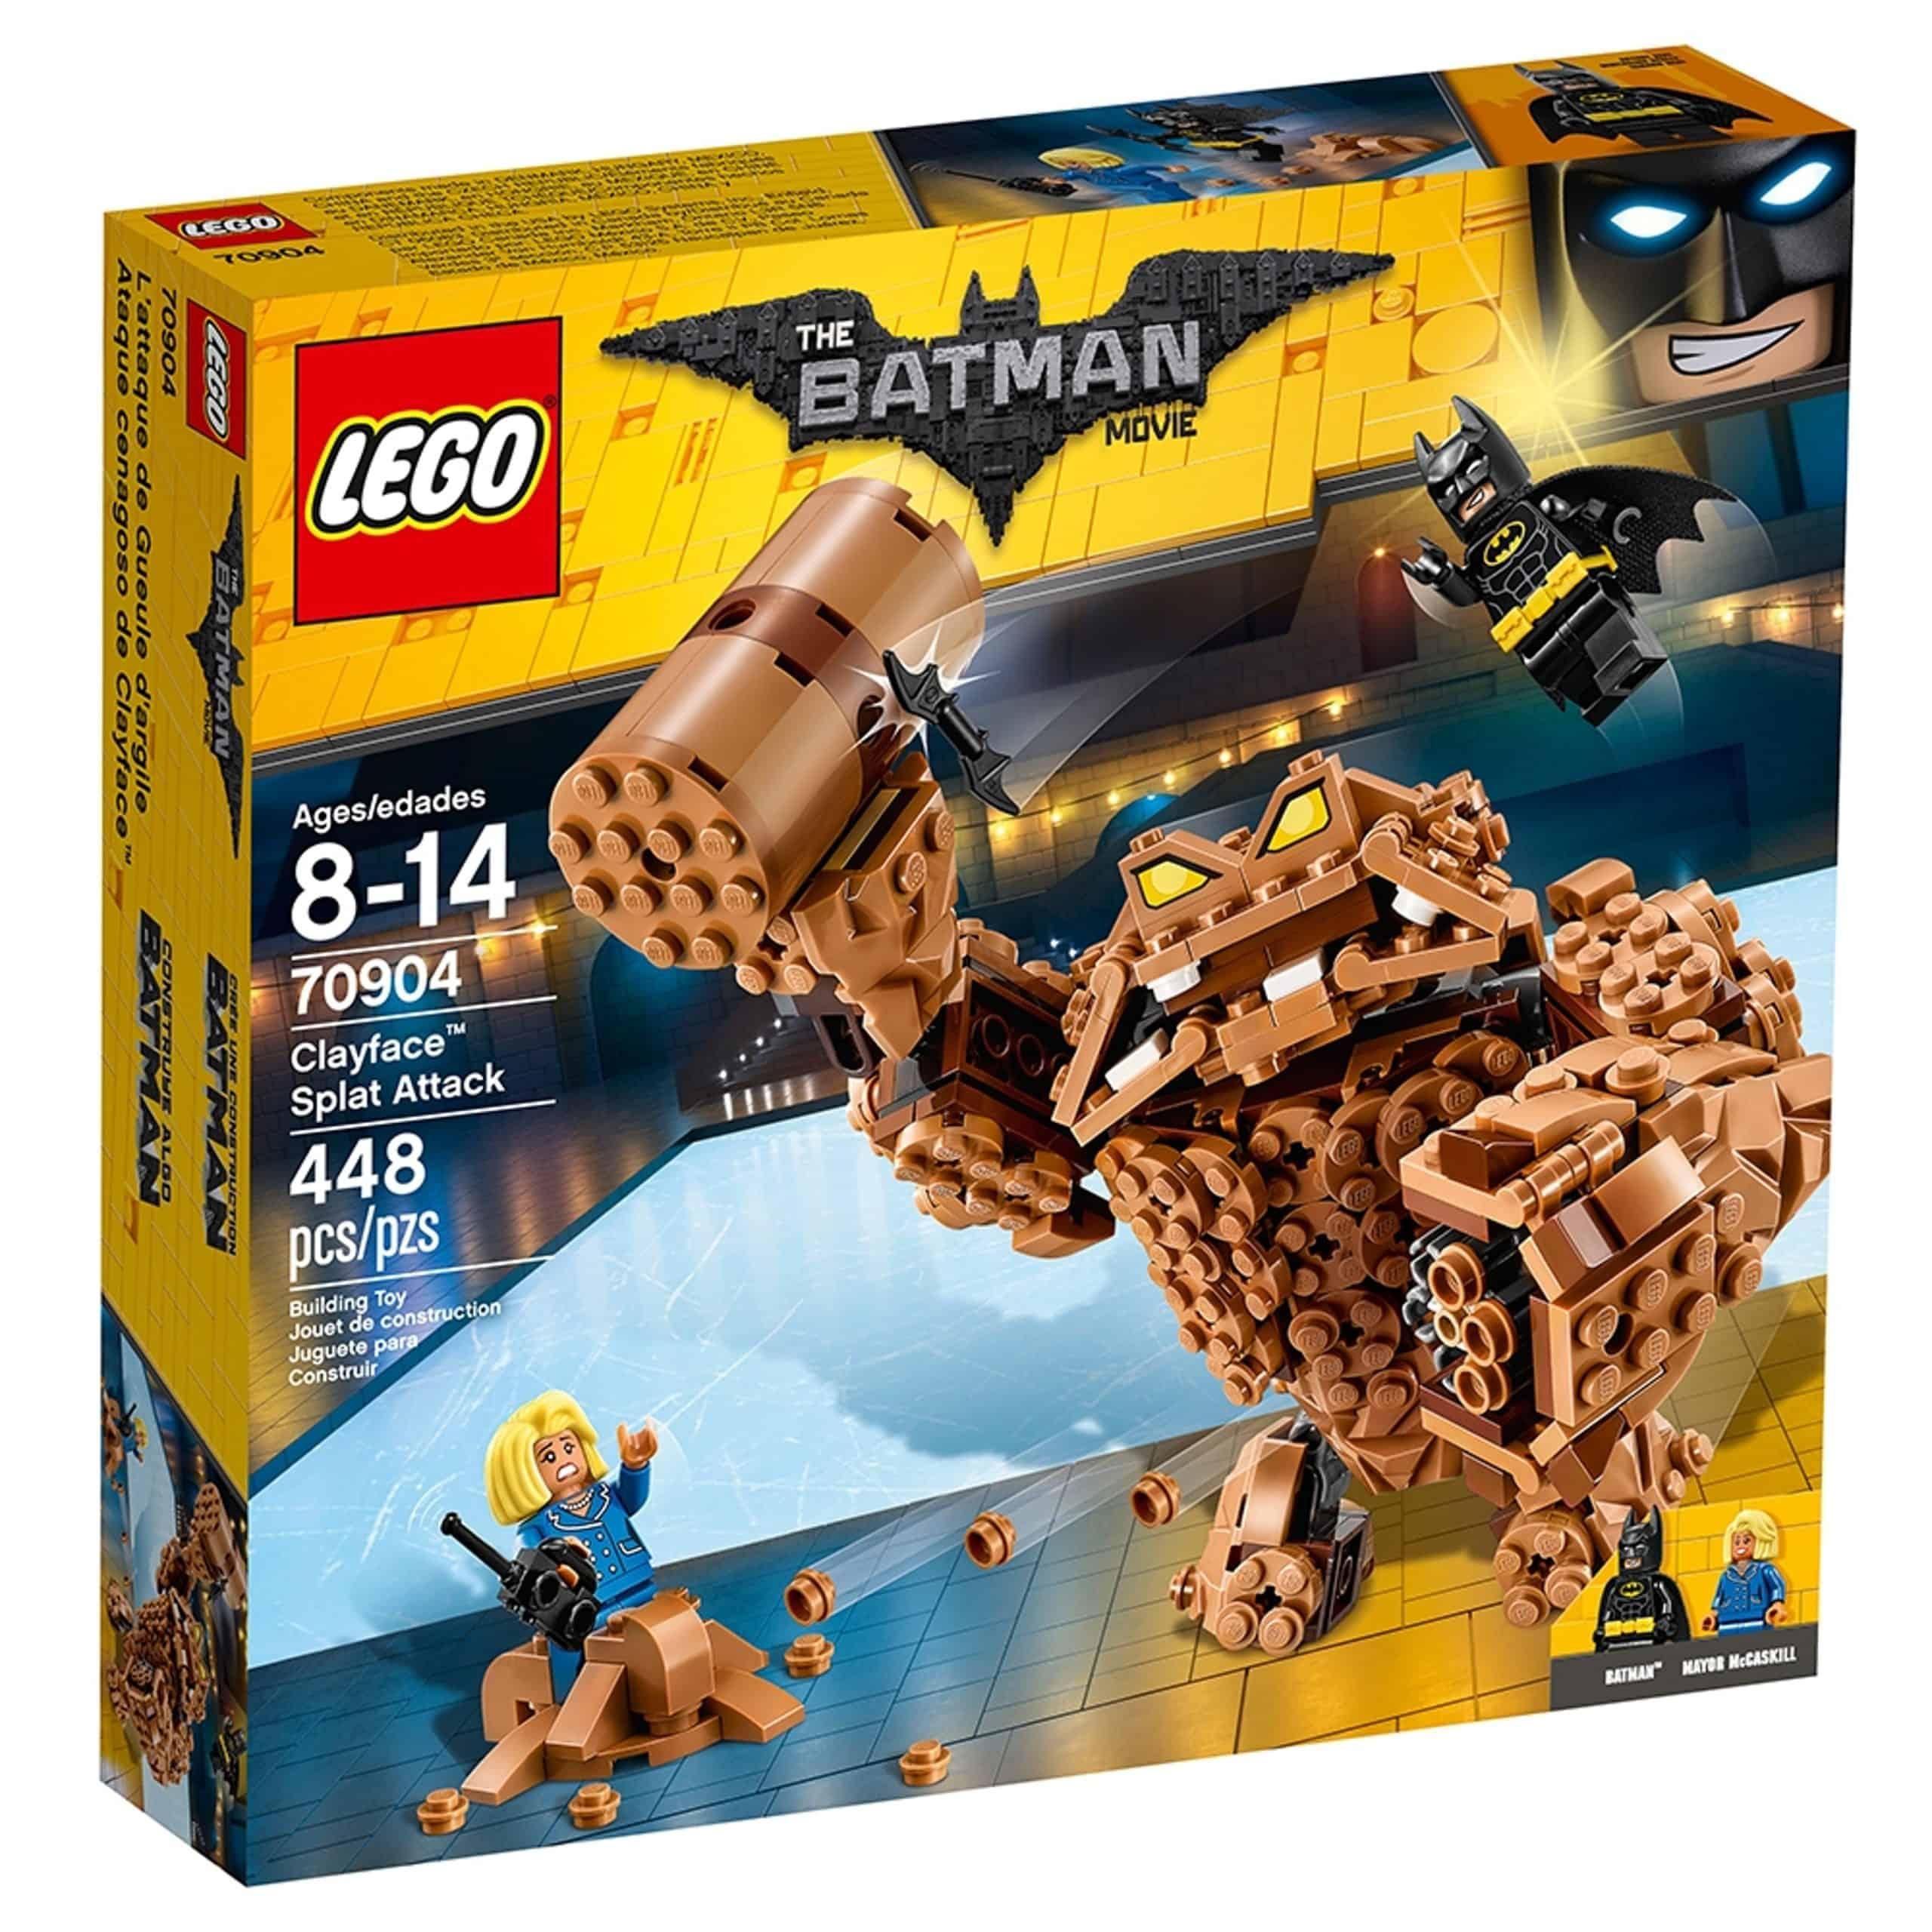 lego 70904 clayface splatangreb scaled